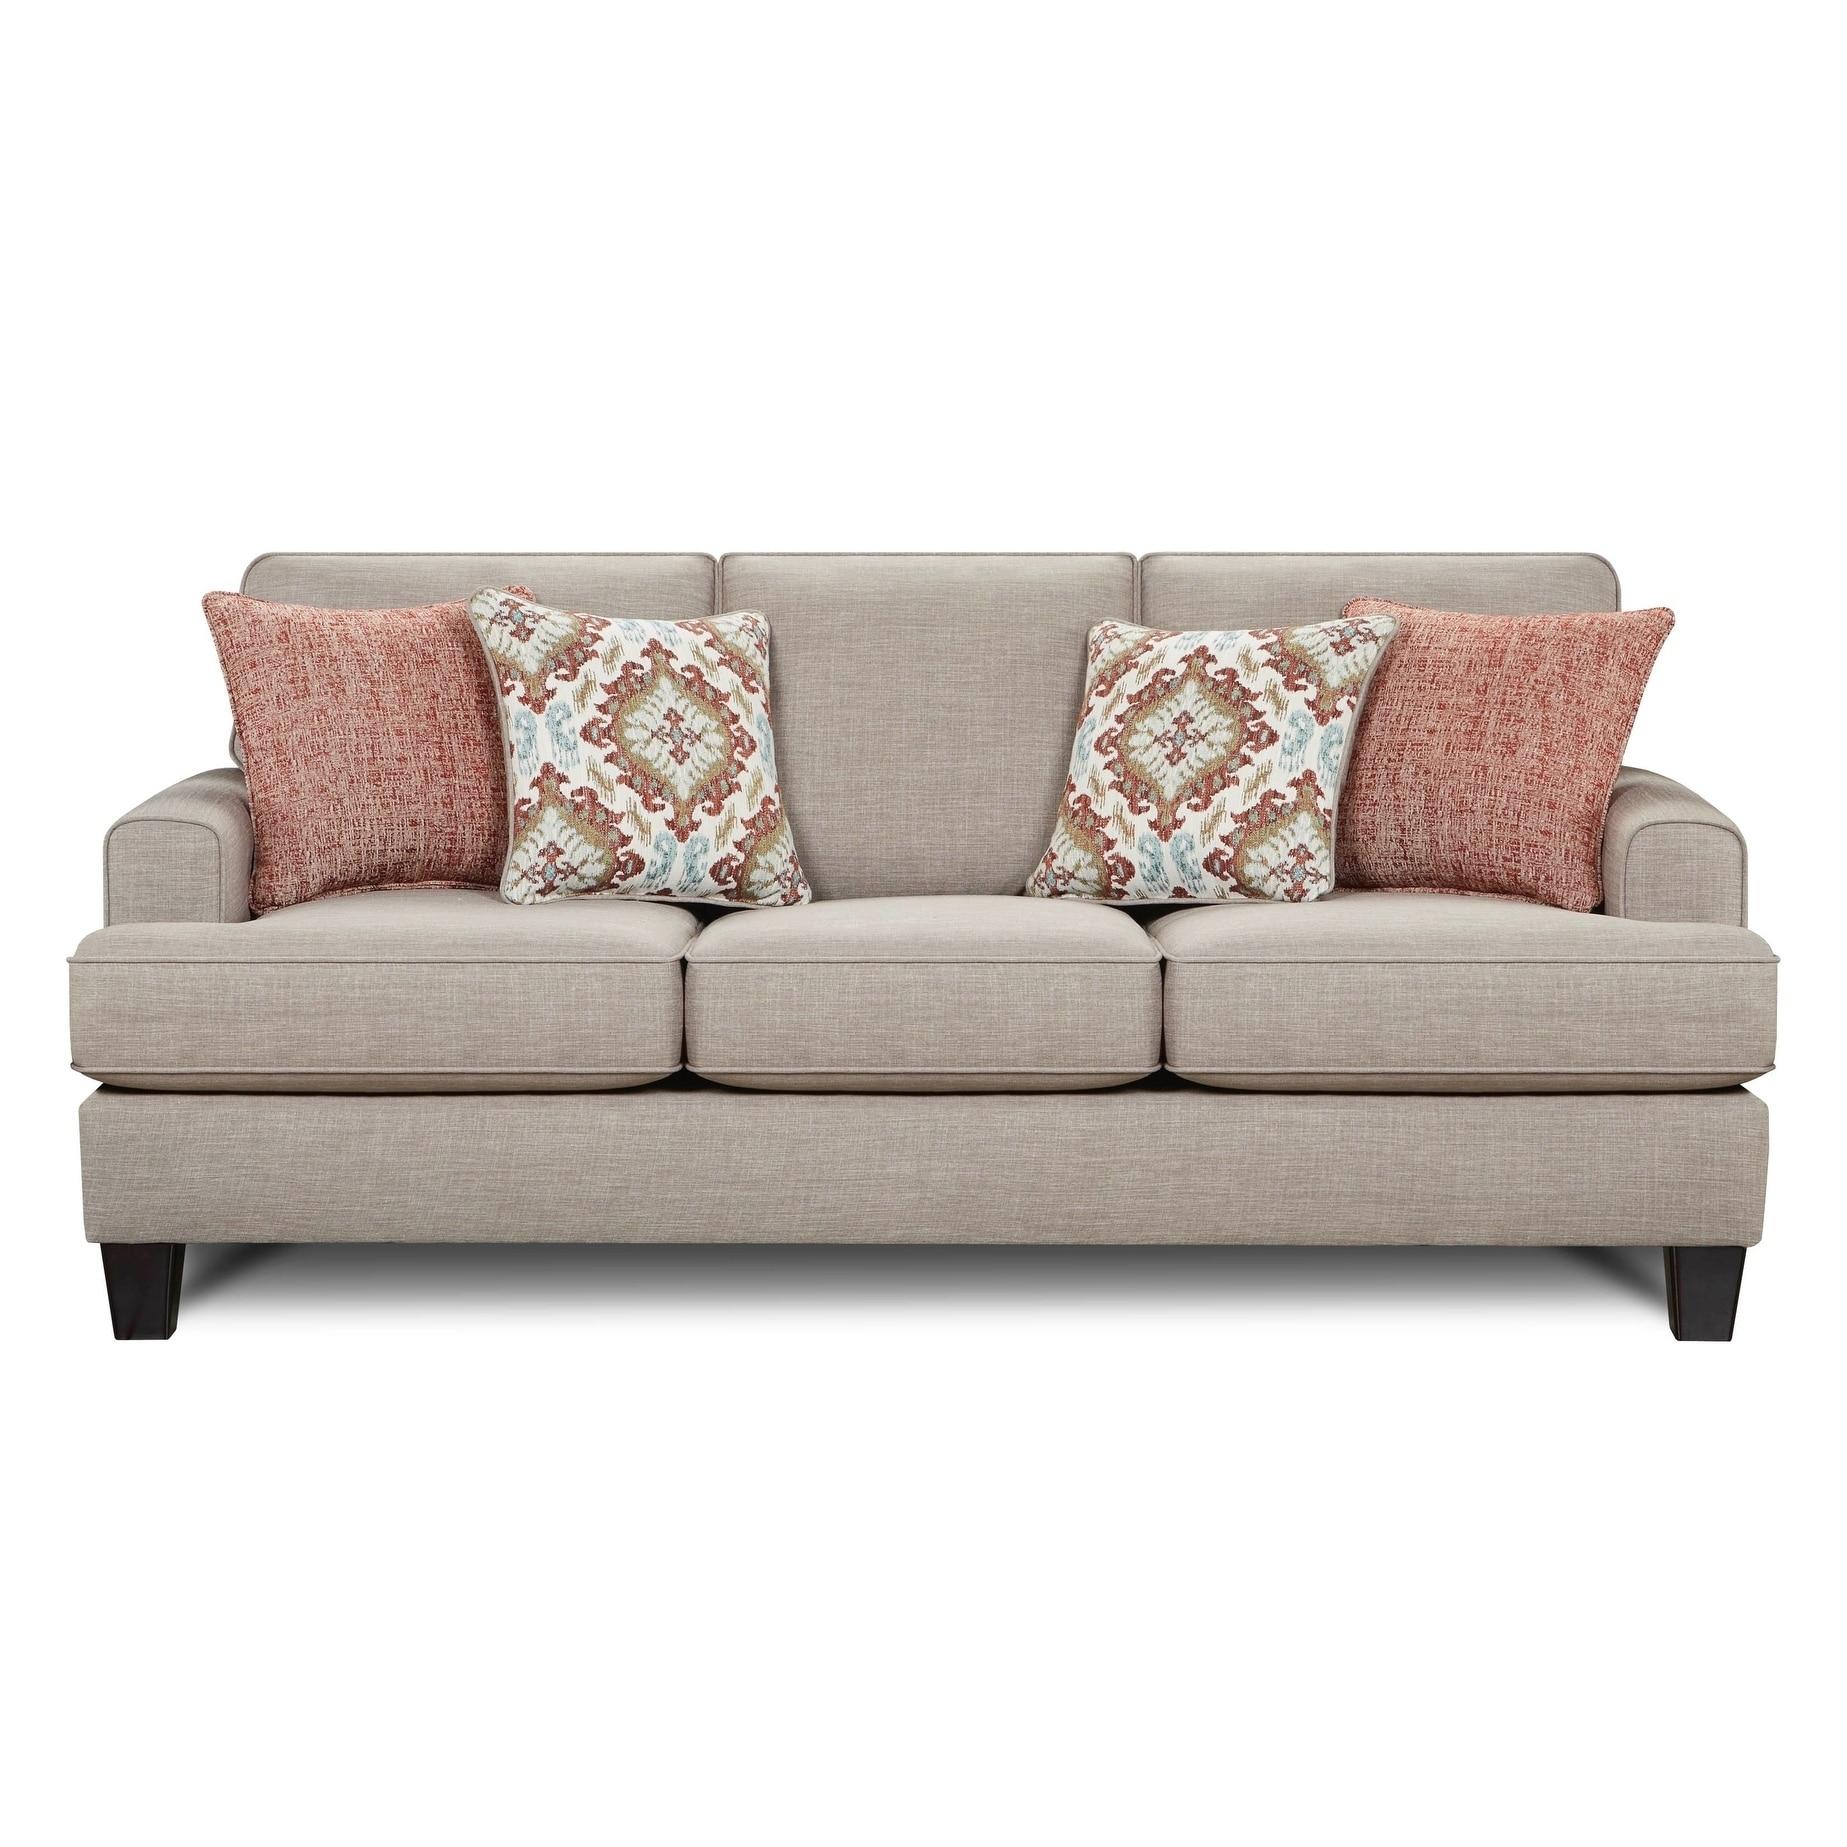 shop quinn twilight sleeper sofa free shipping today overstock rh overstock com twilight sleeper sofa ebay twilight sleeper sofa review